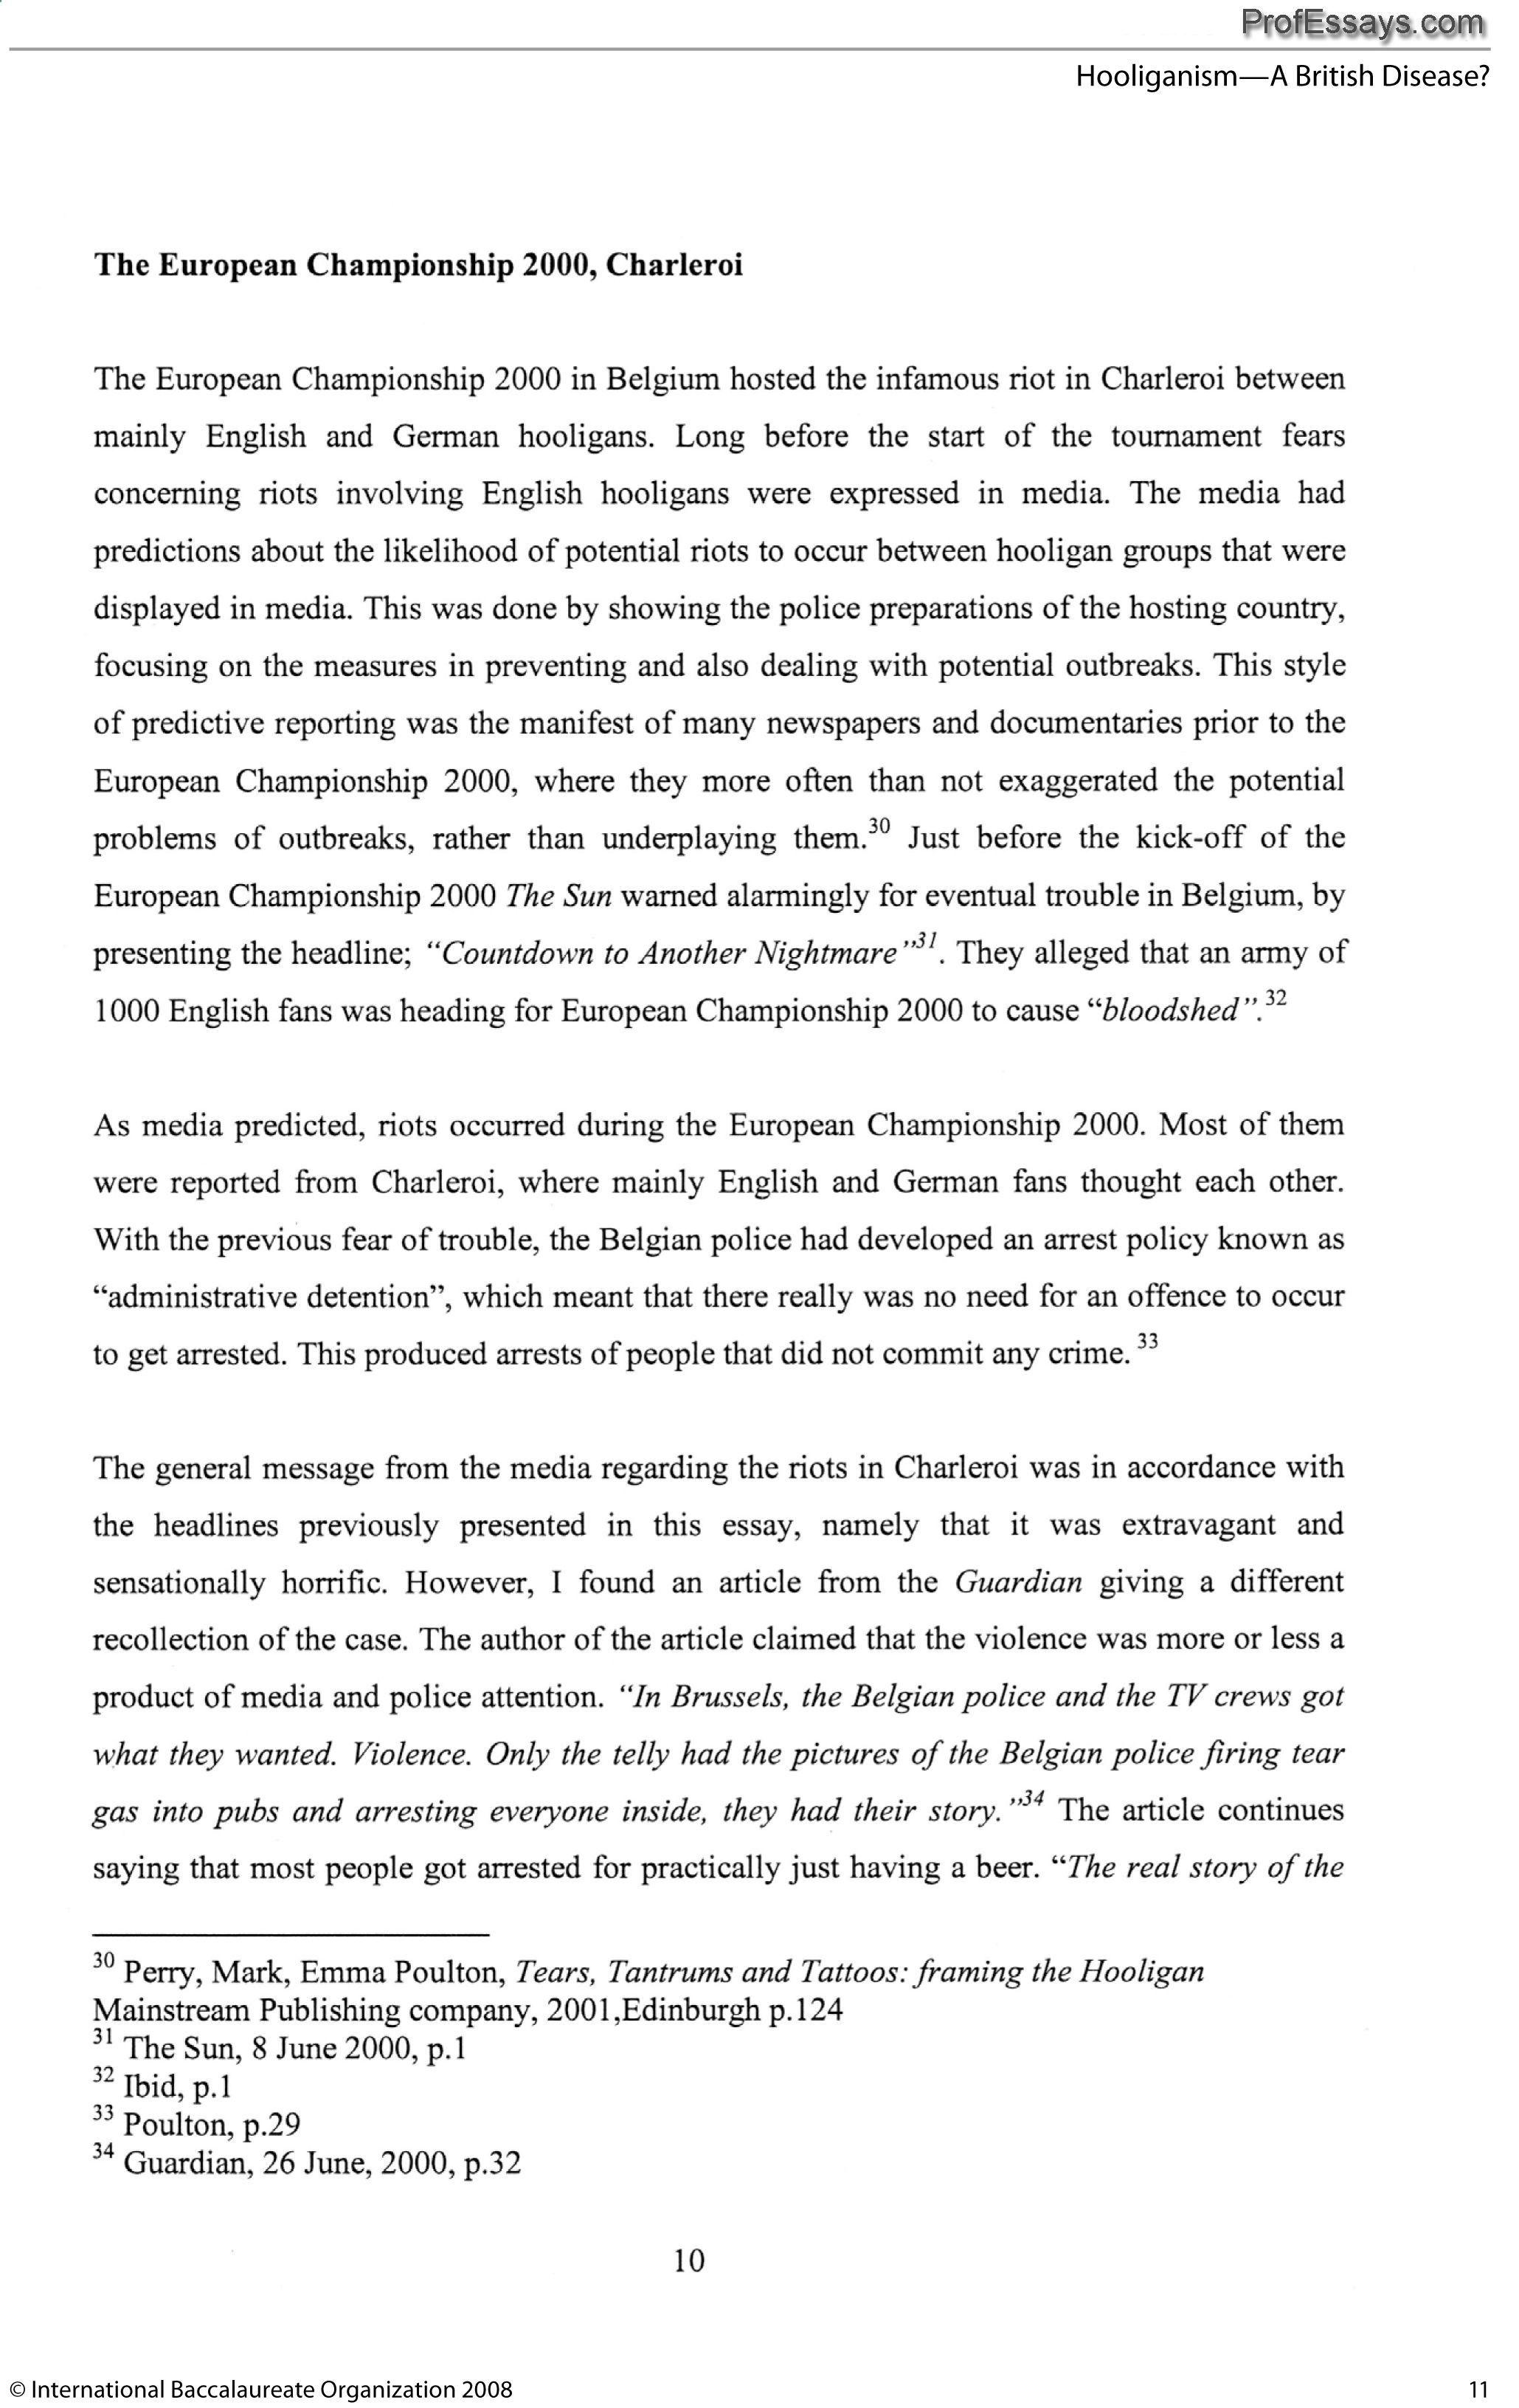 Free Essay Writing Service Inovasyonkocu Com Examples On Elderly People